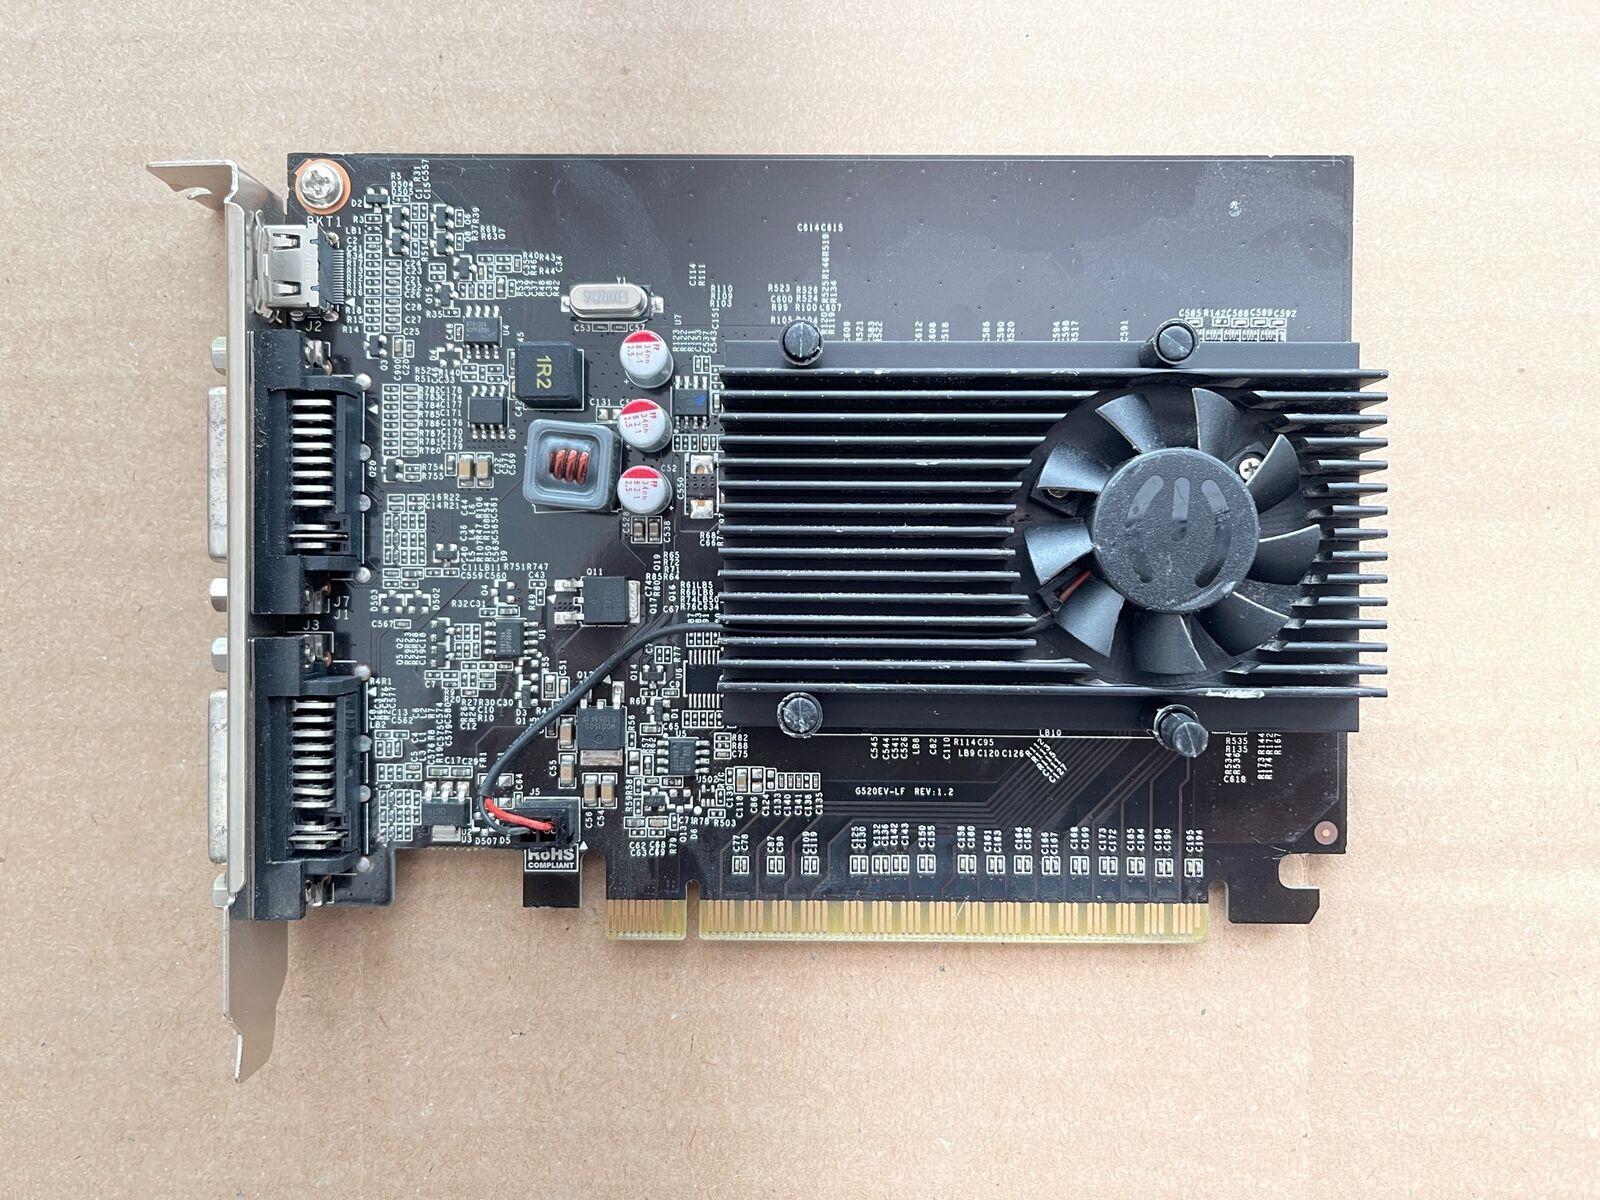 EVGA GEFORCE GT 610 1GB GDDR 3 、 デュアル DVI ミニHDMI ビデオカード 01G